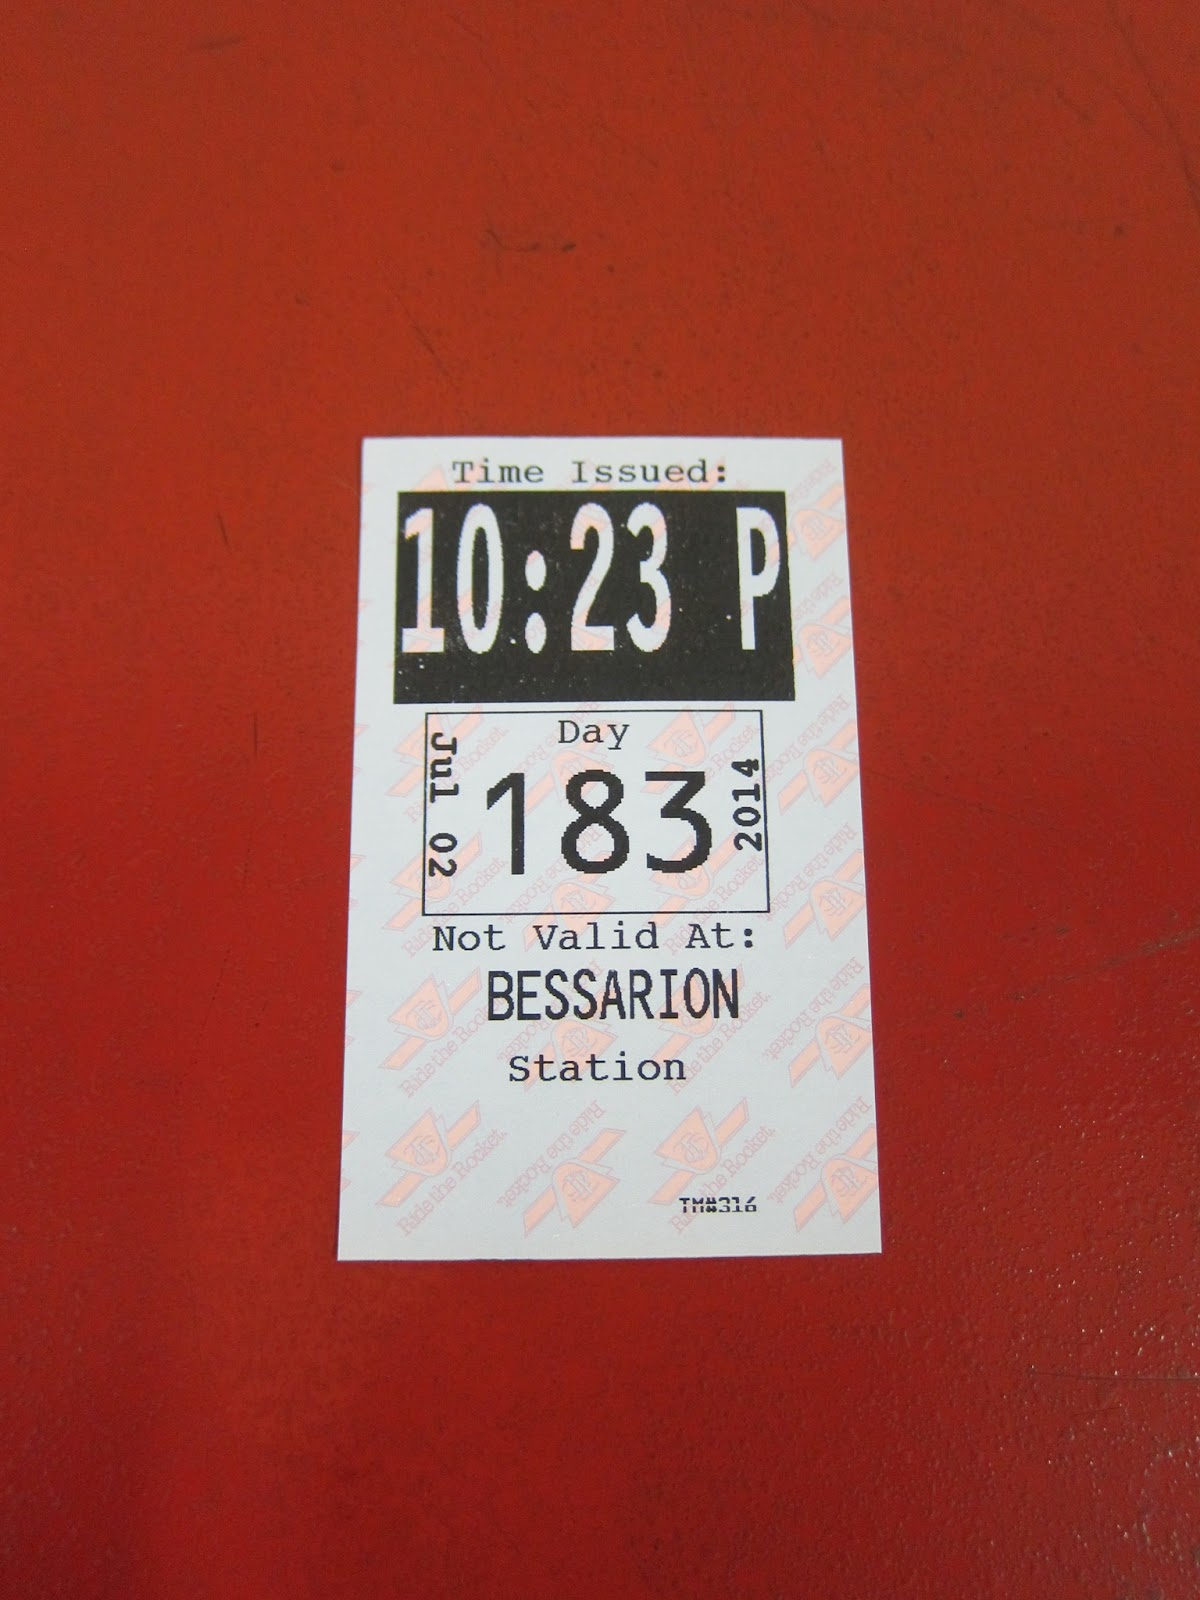 Bessarion station transfer